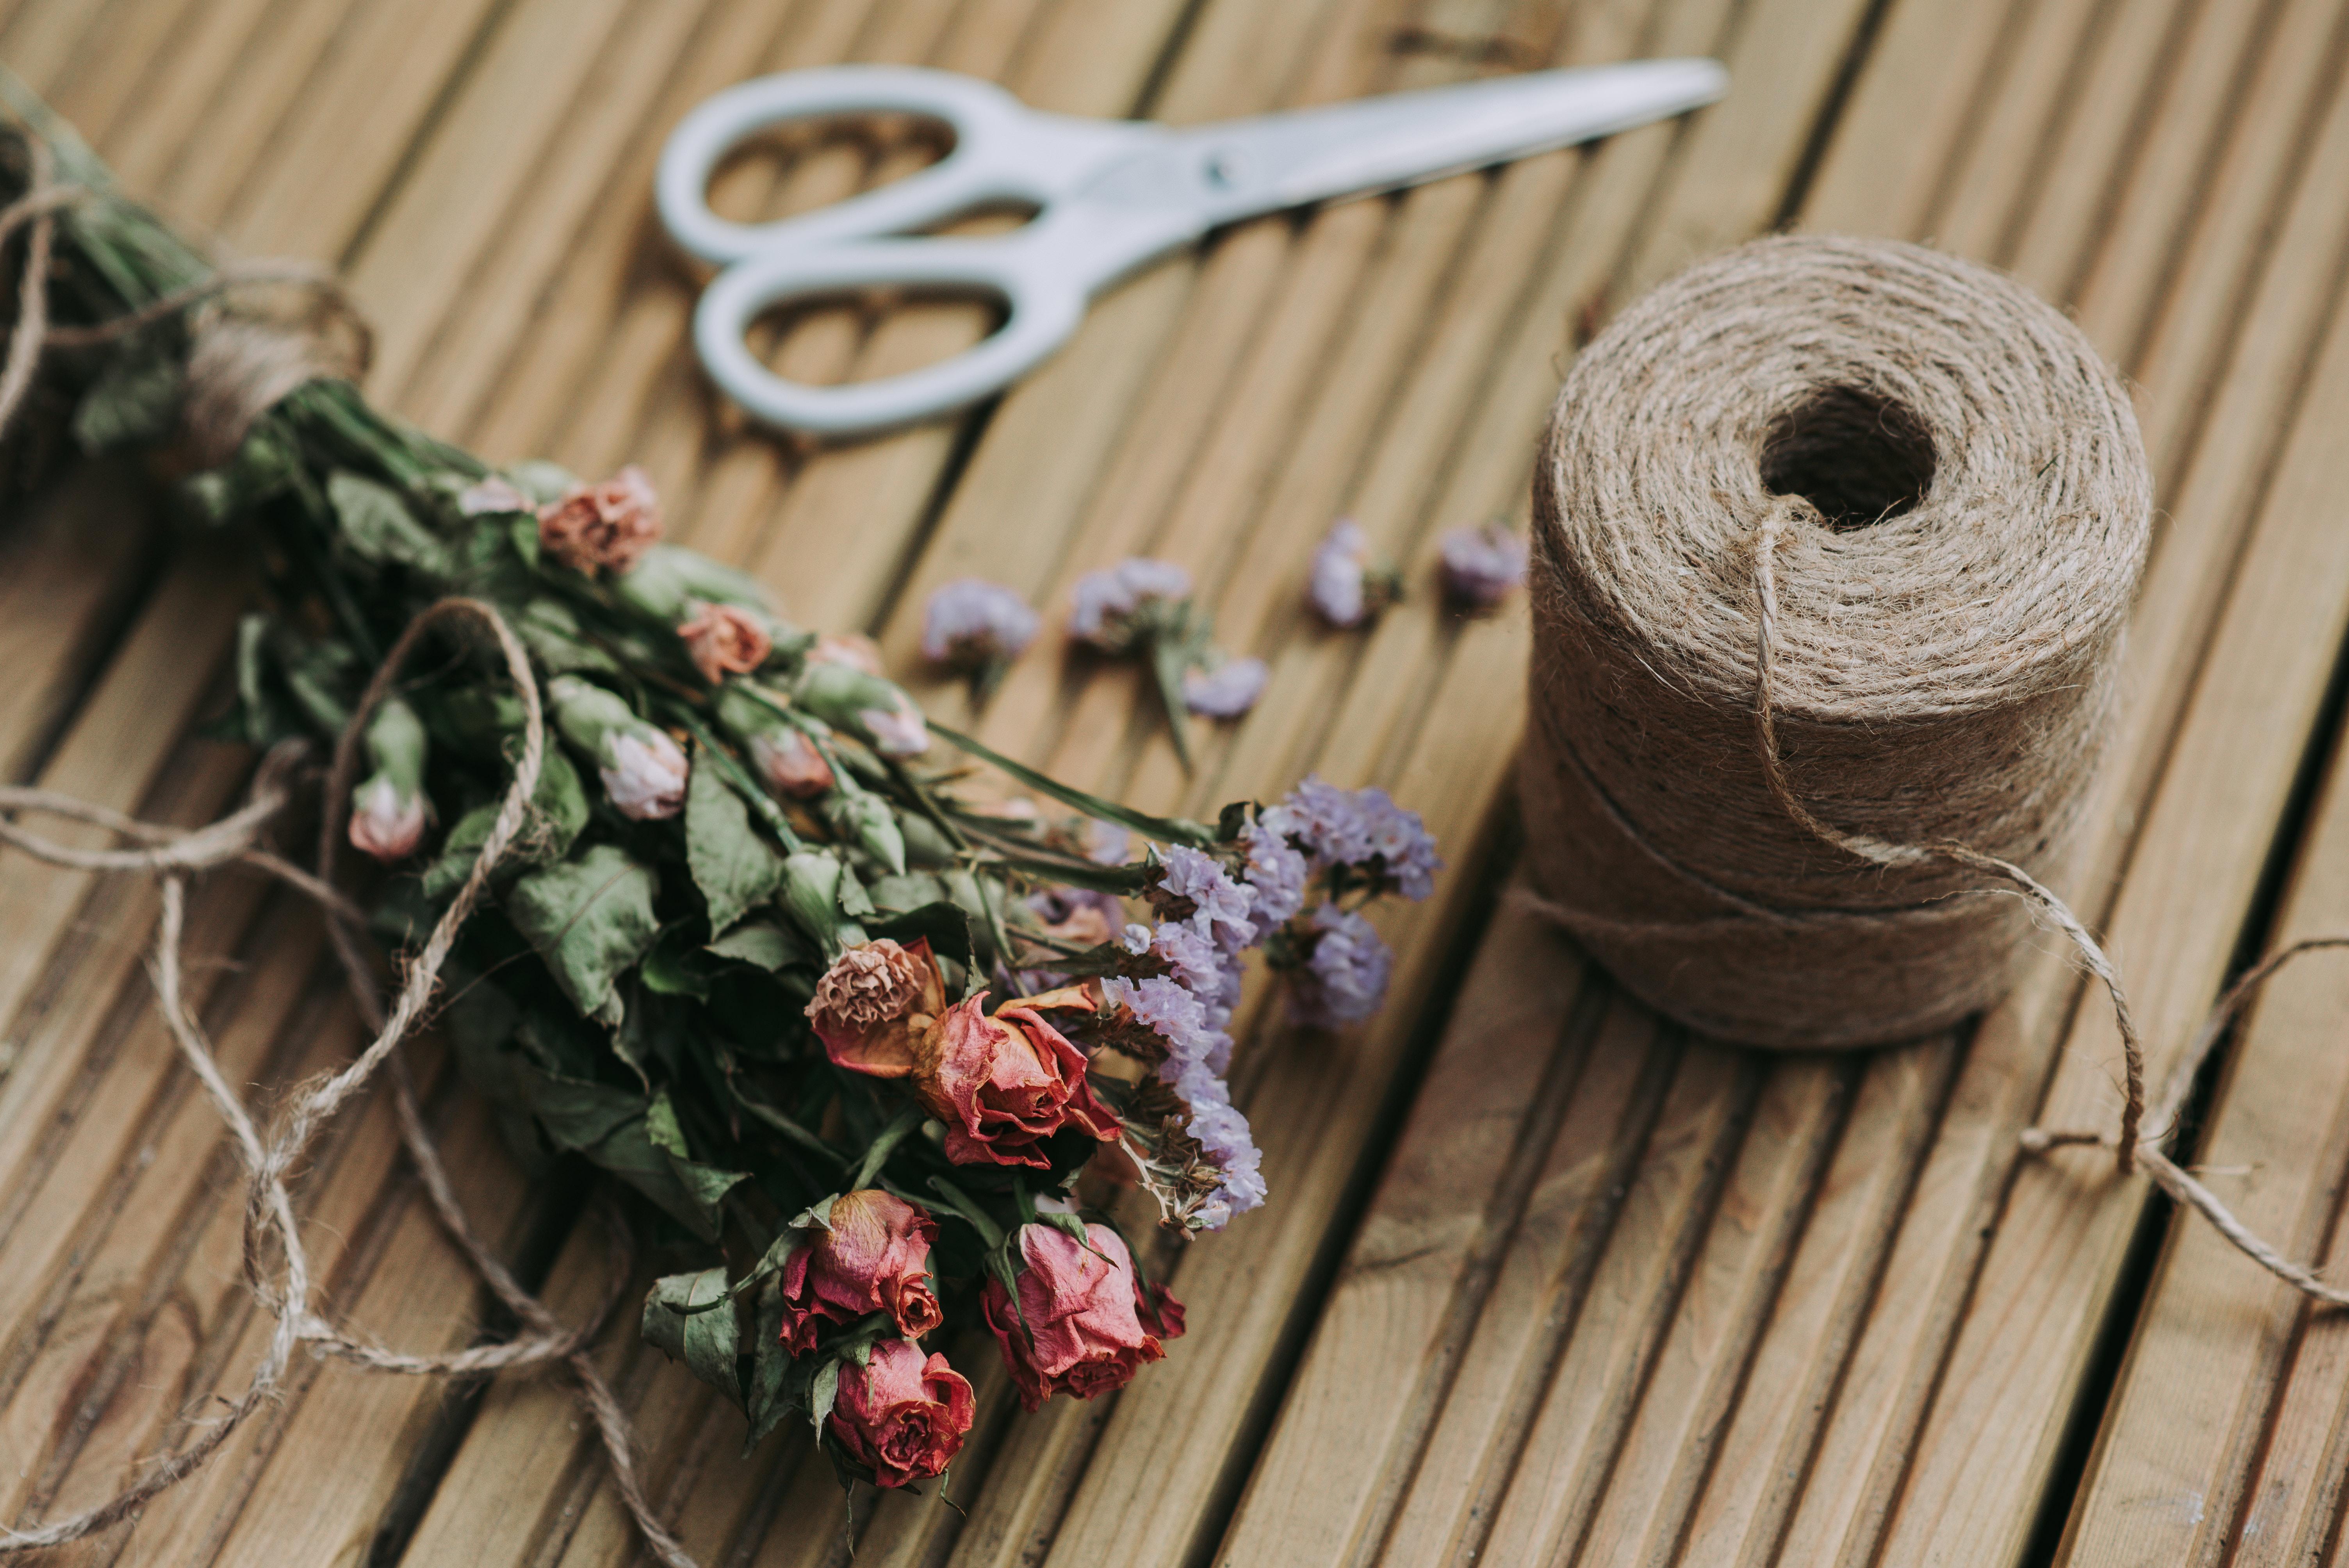 color-decoration-dried-flowers-1166416